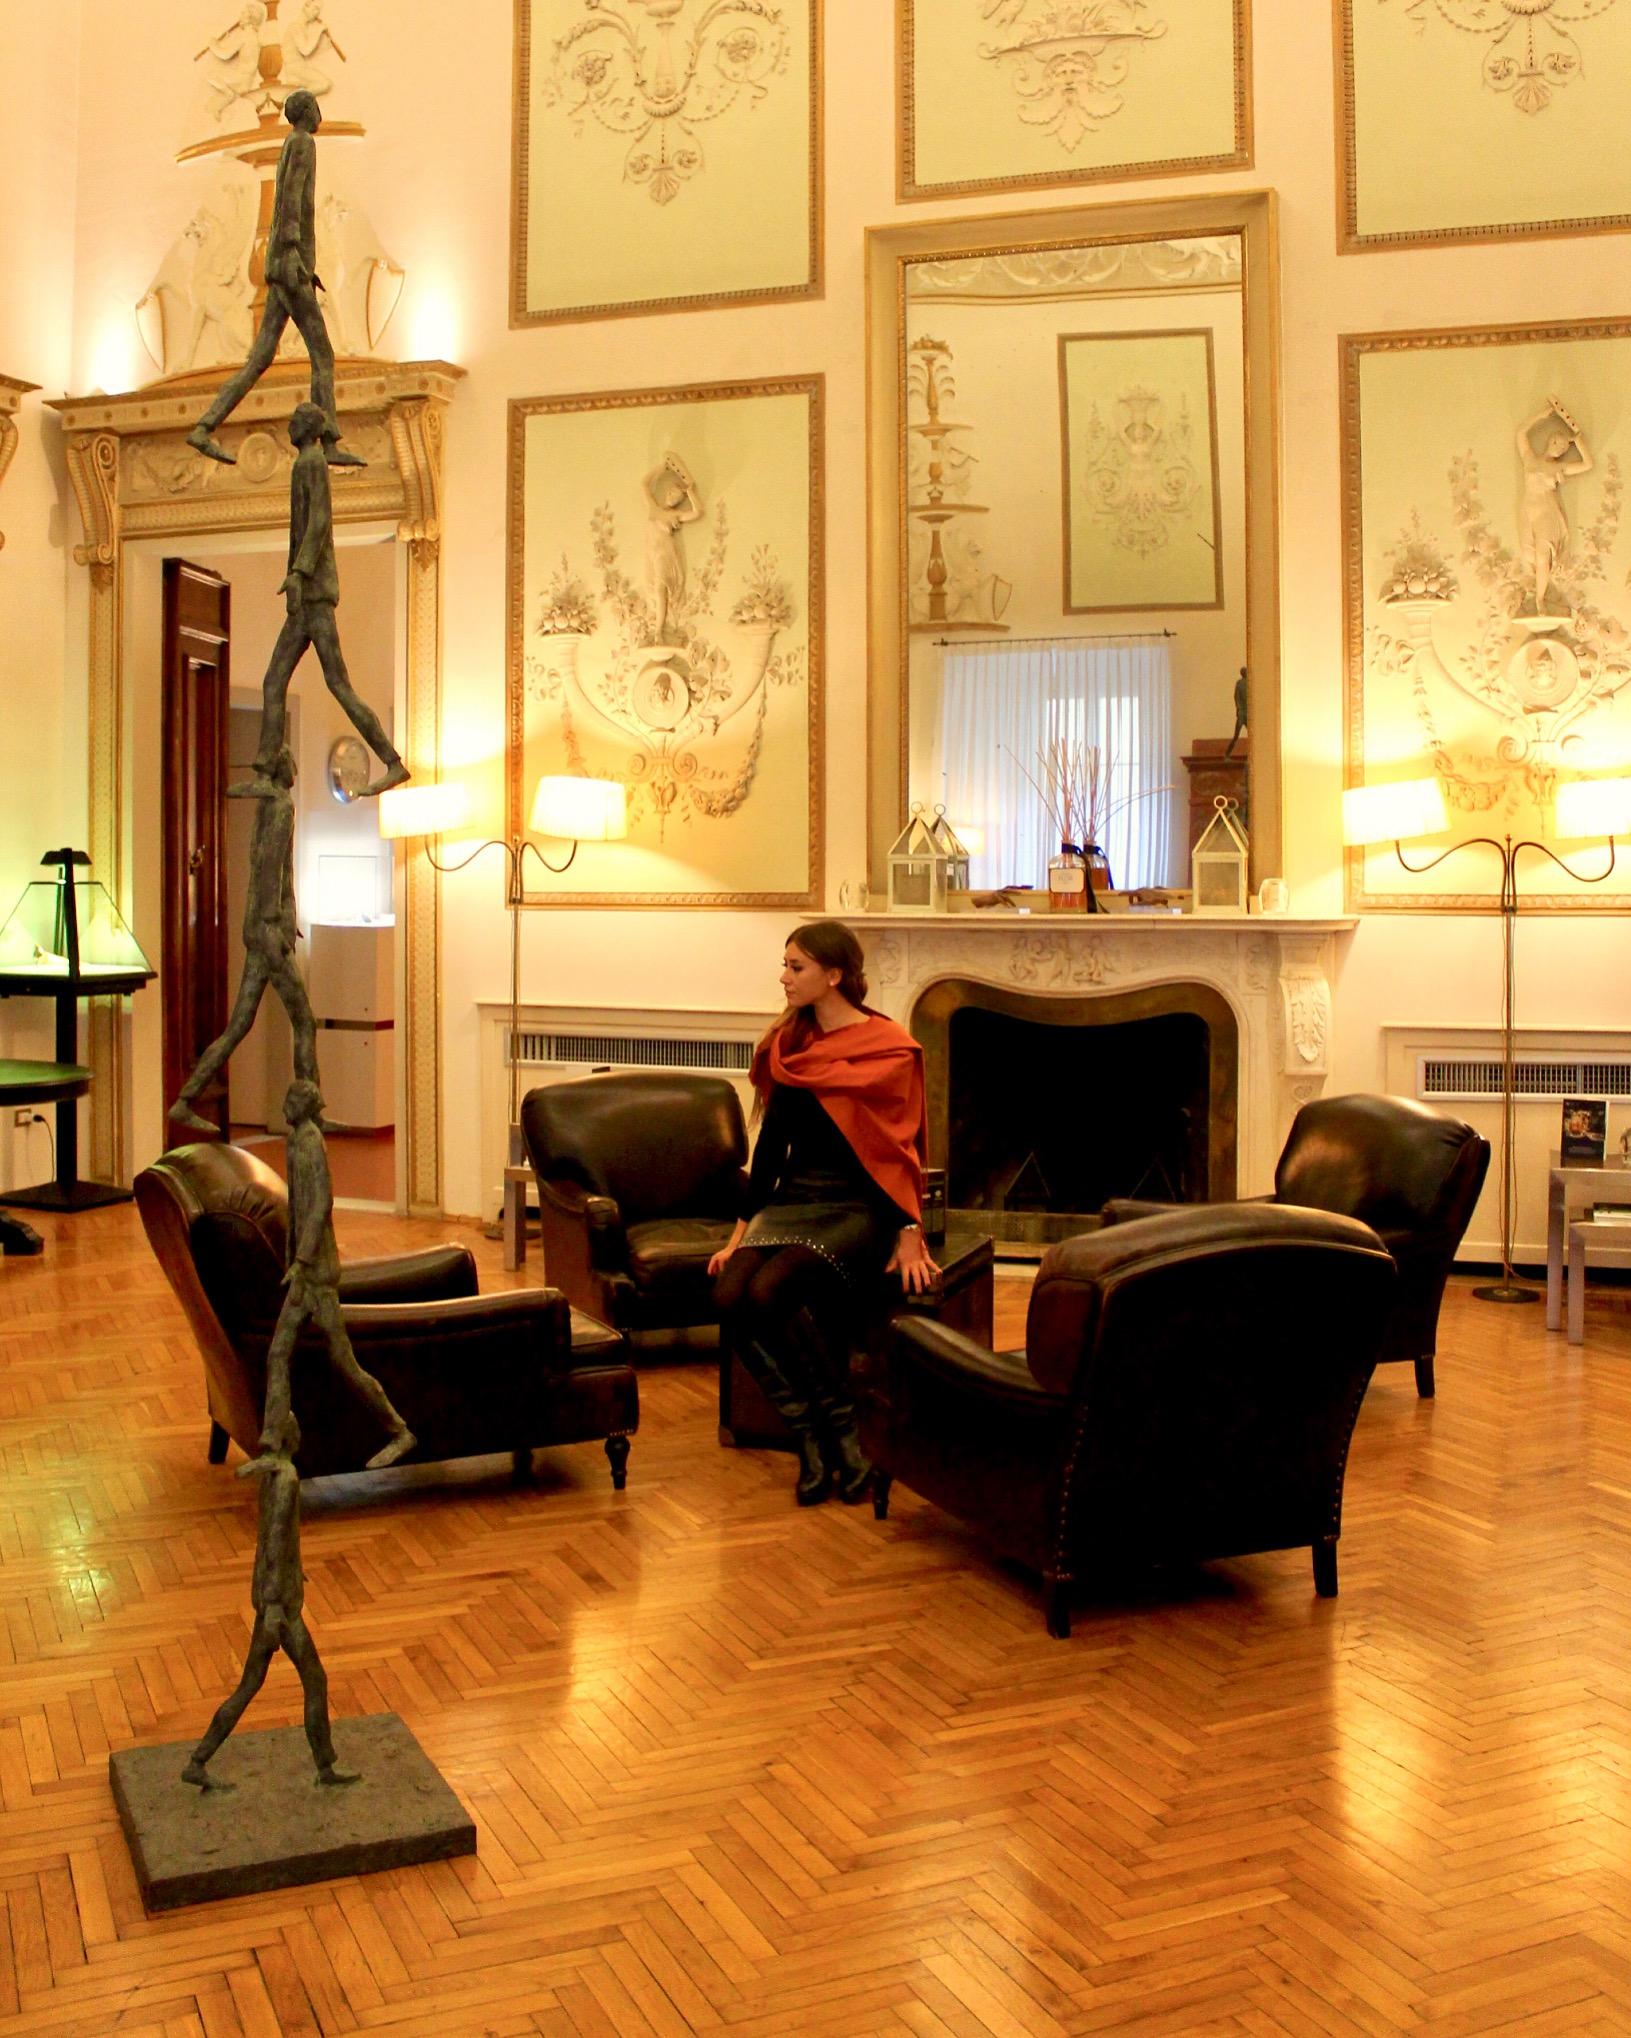 relais-santa-croce-firenze-luxury-lustforthesublime